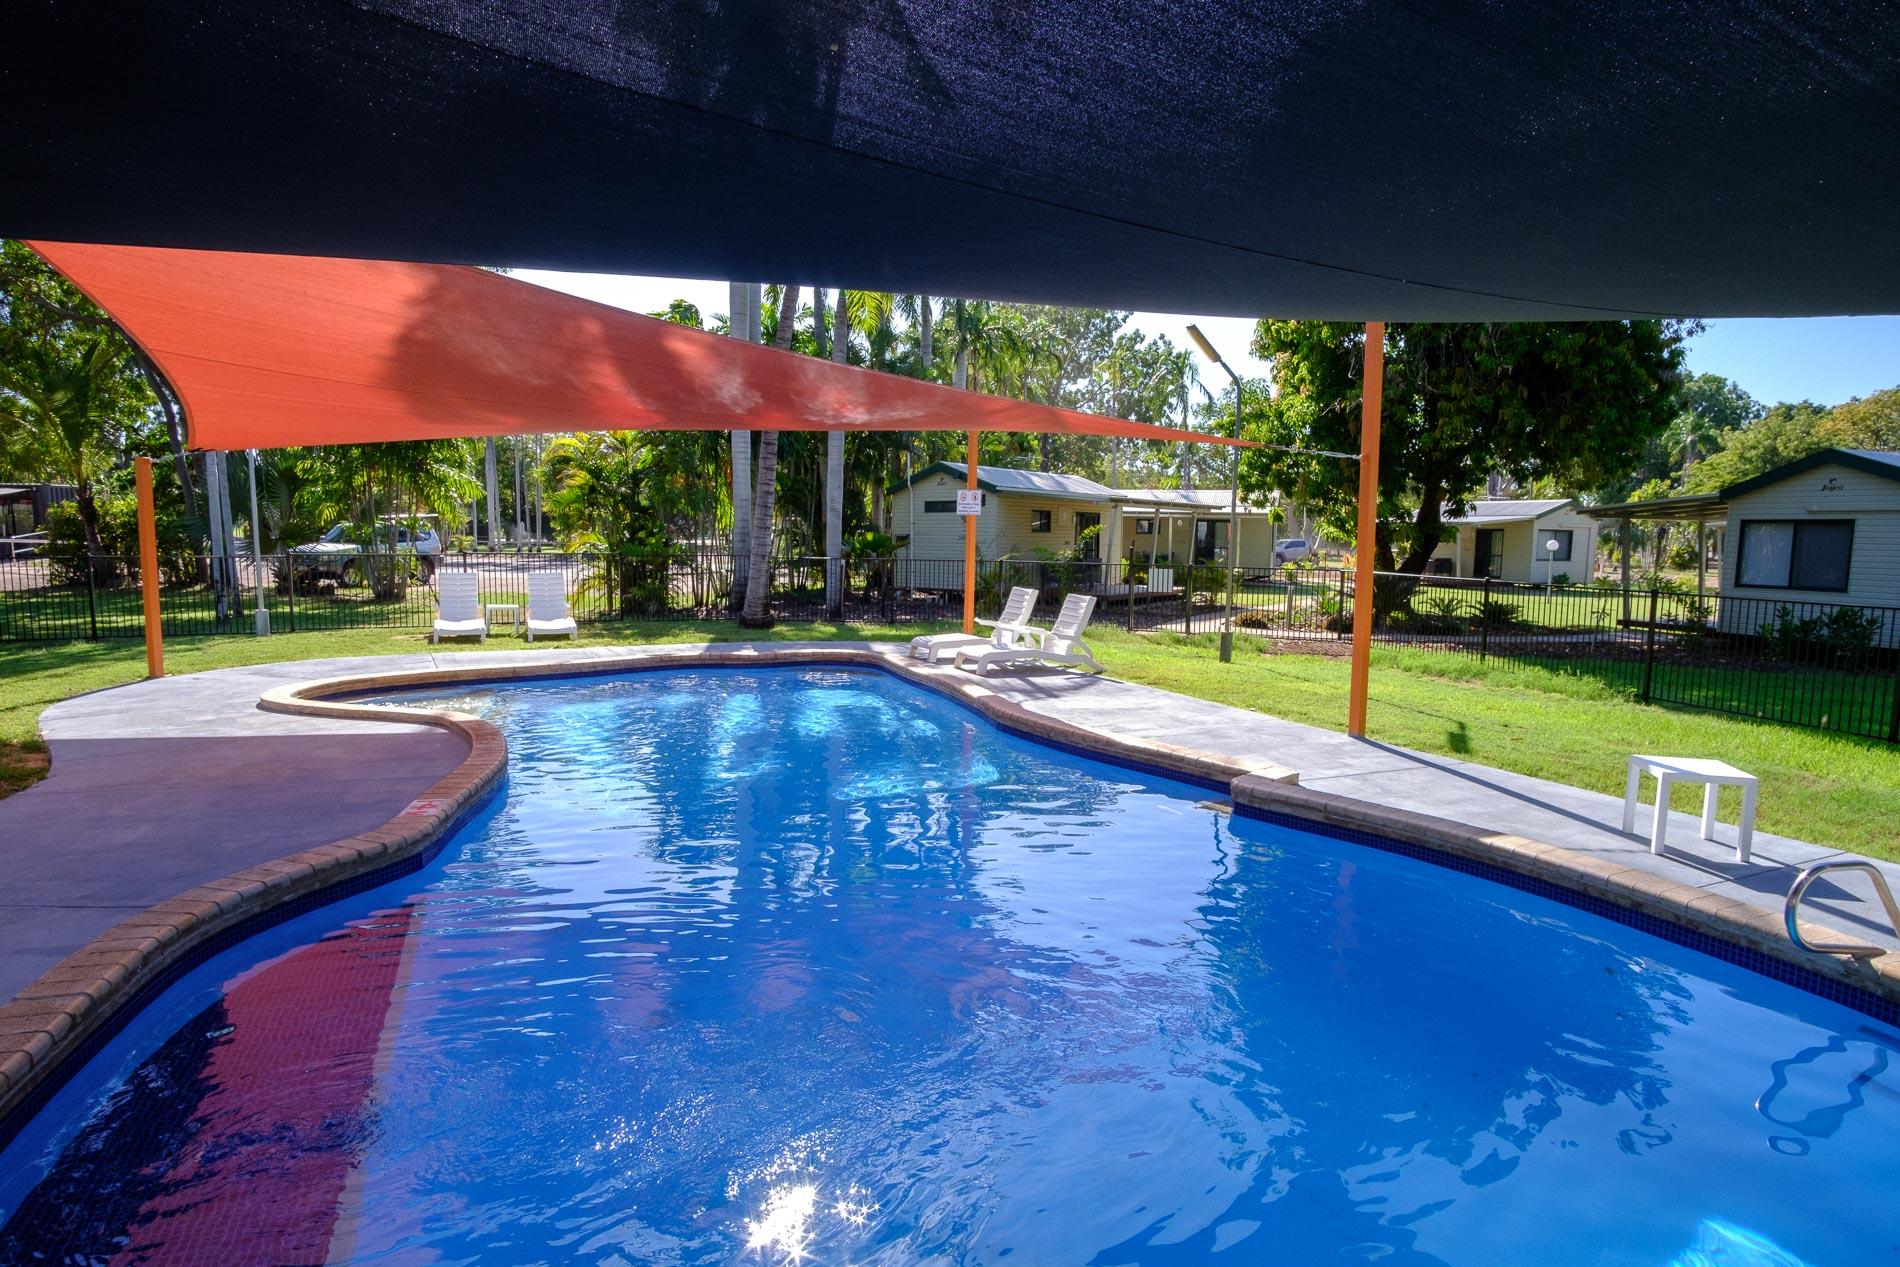 Sparkling Blue Pool at Kimberleyland